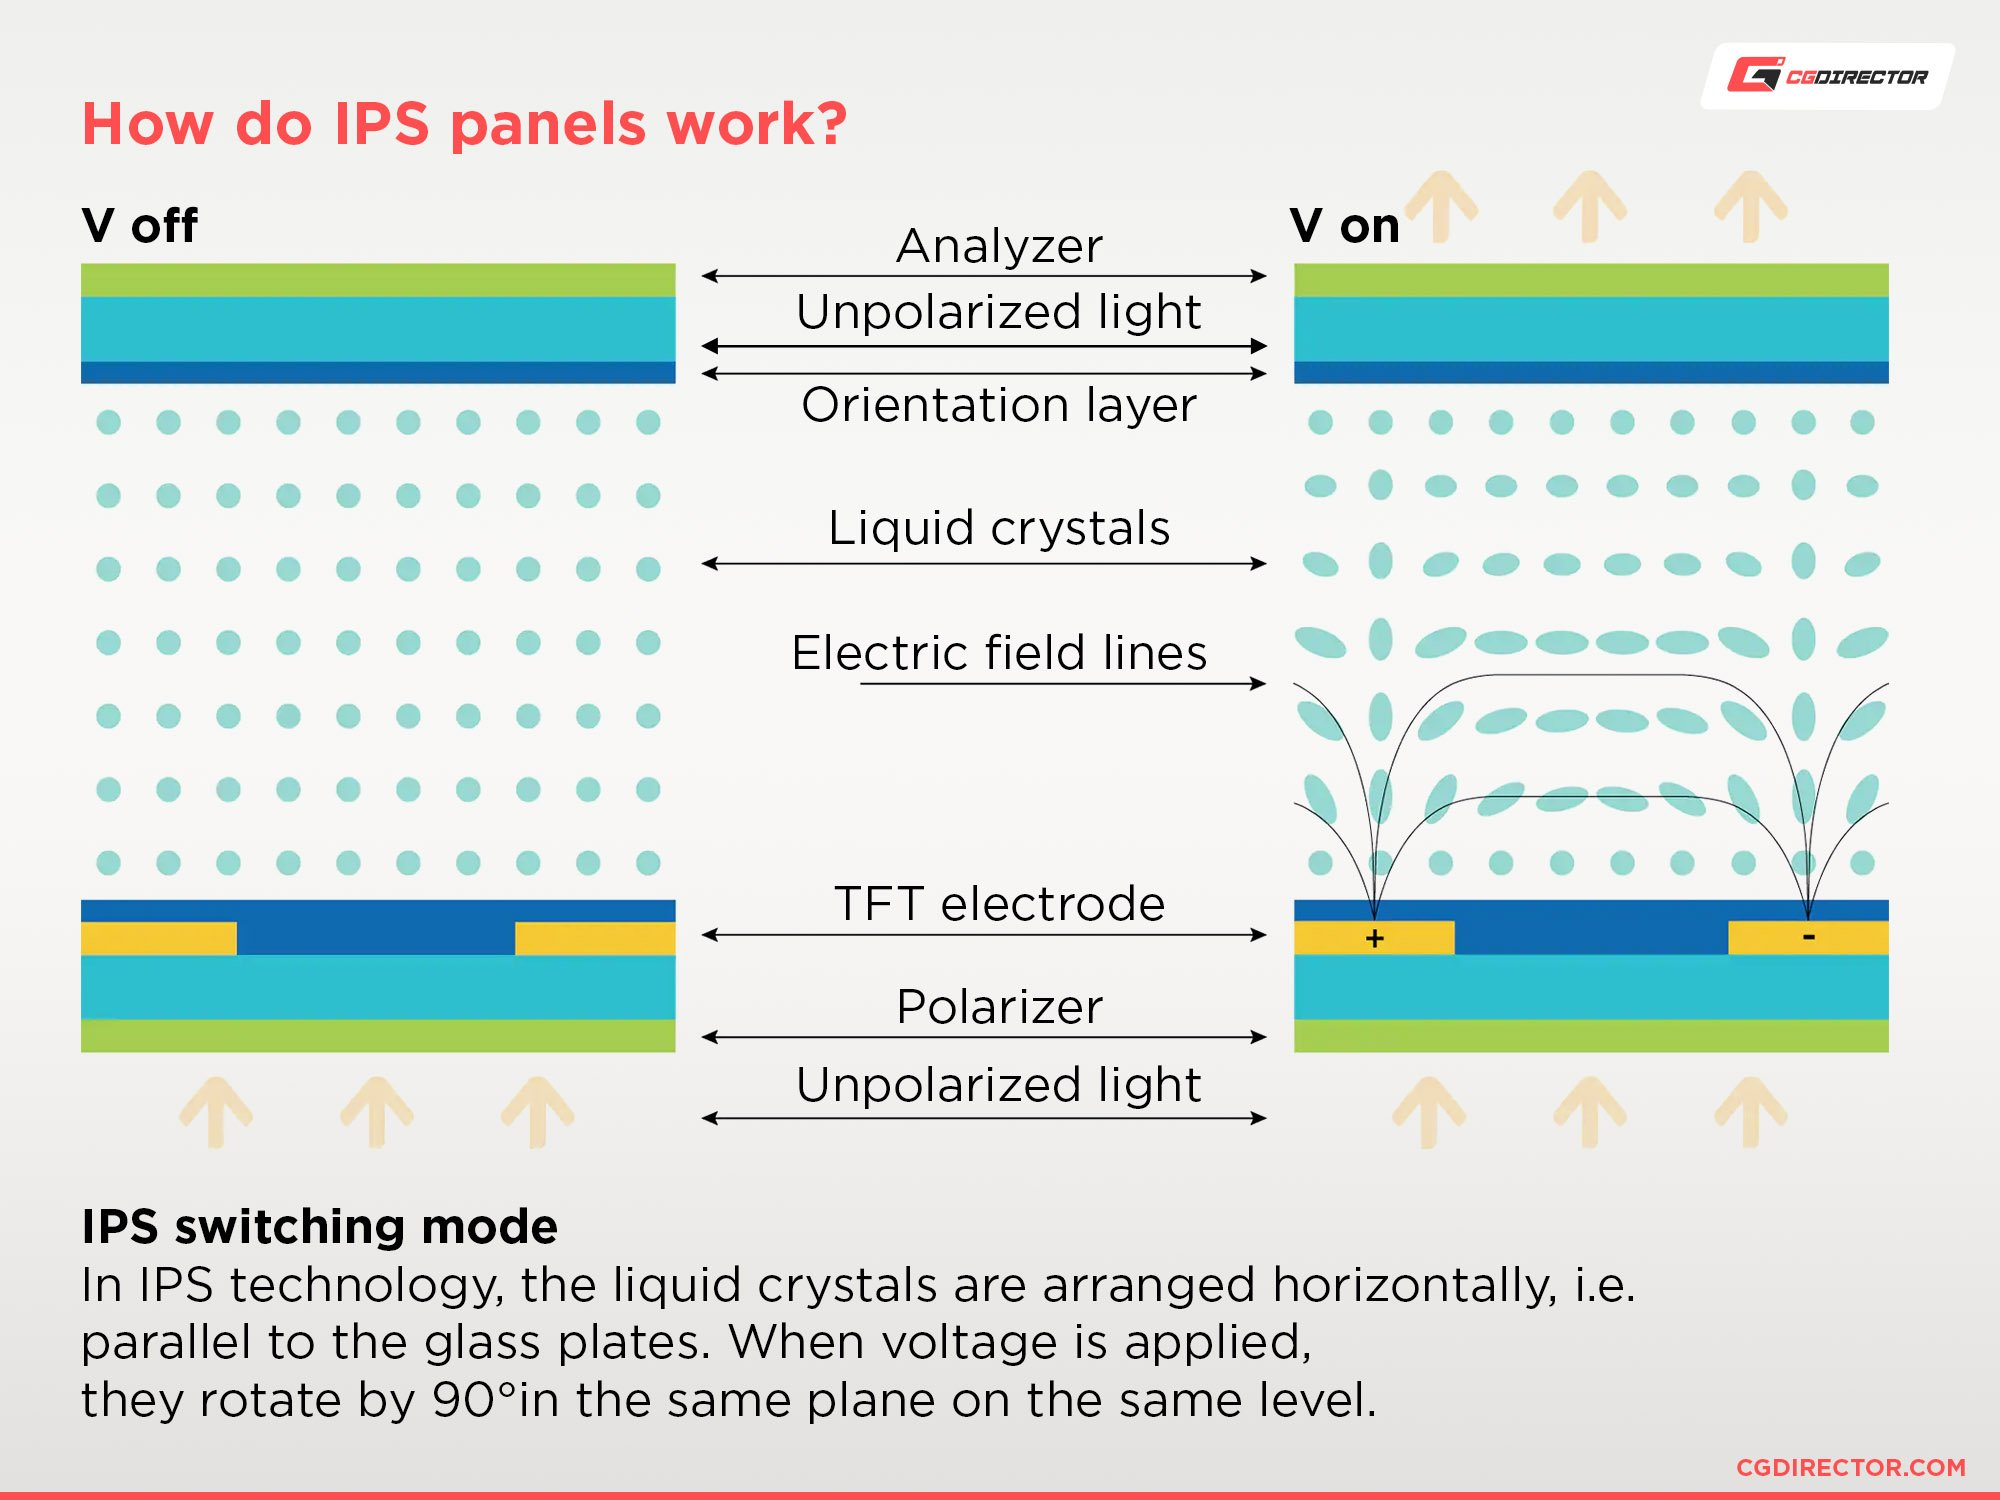 How do IPS panels work